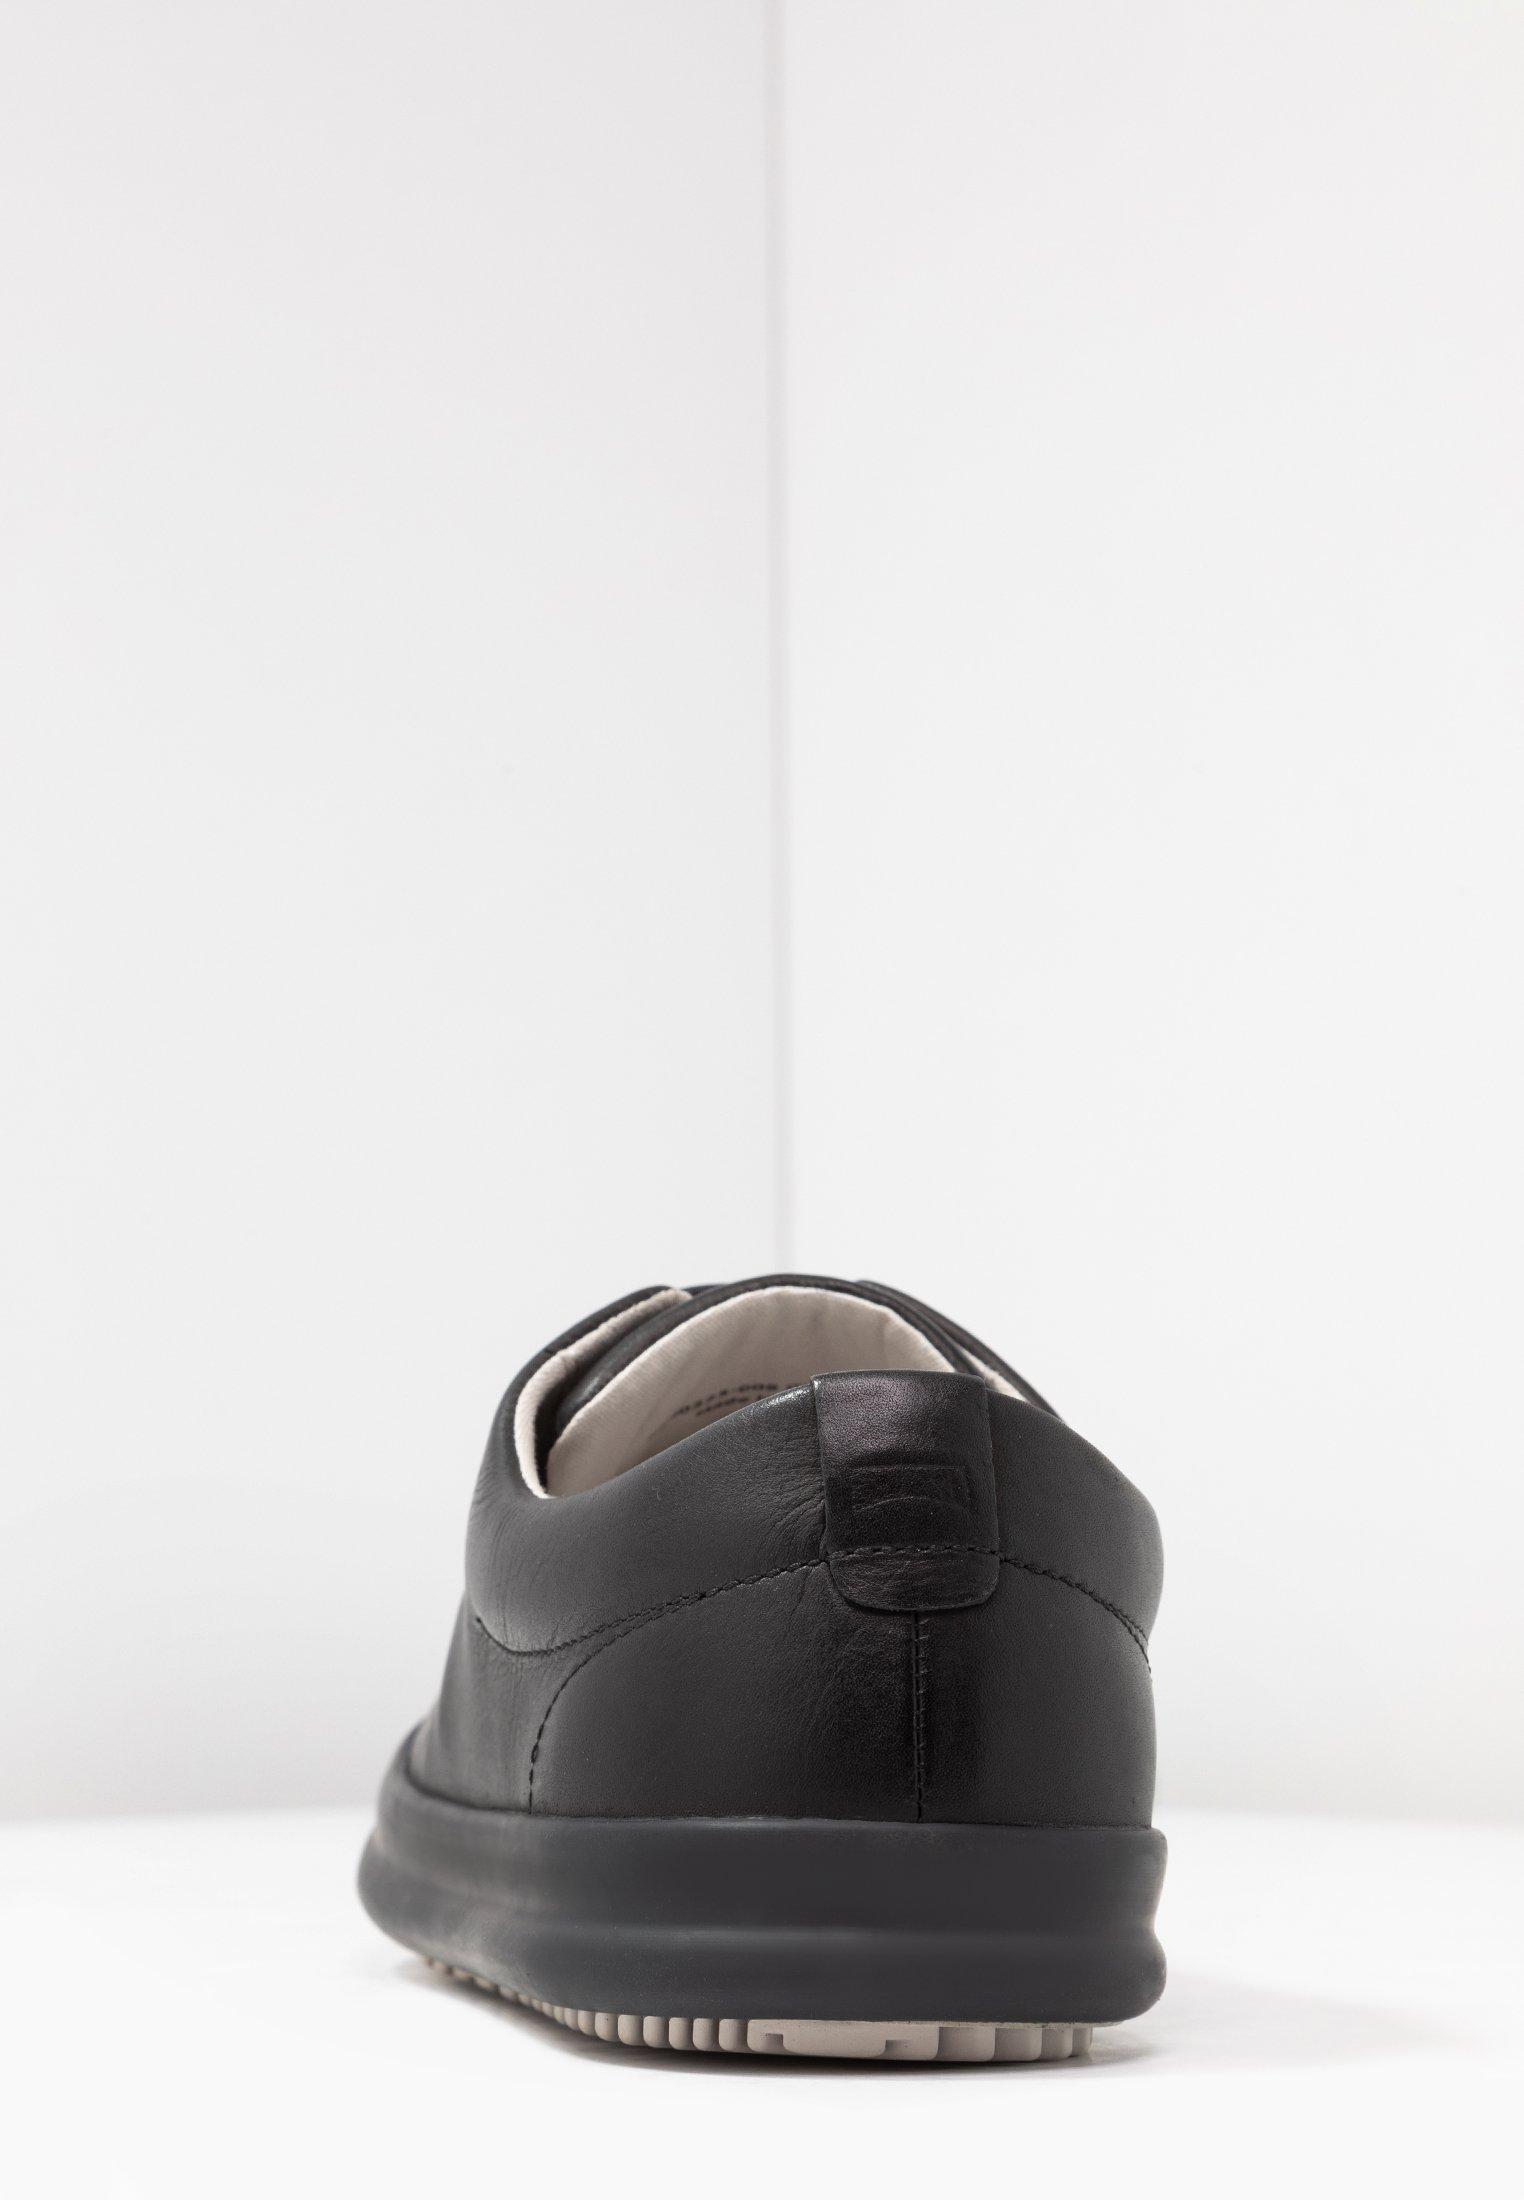 Camper Chasis Sport - Sneakers Basse Black Scarpe Scontate